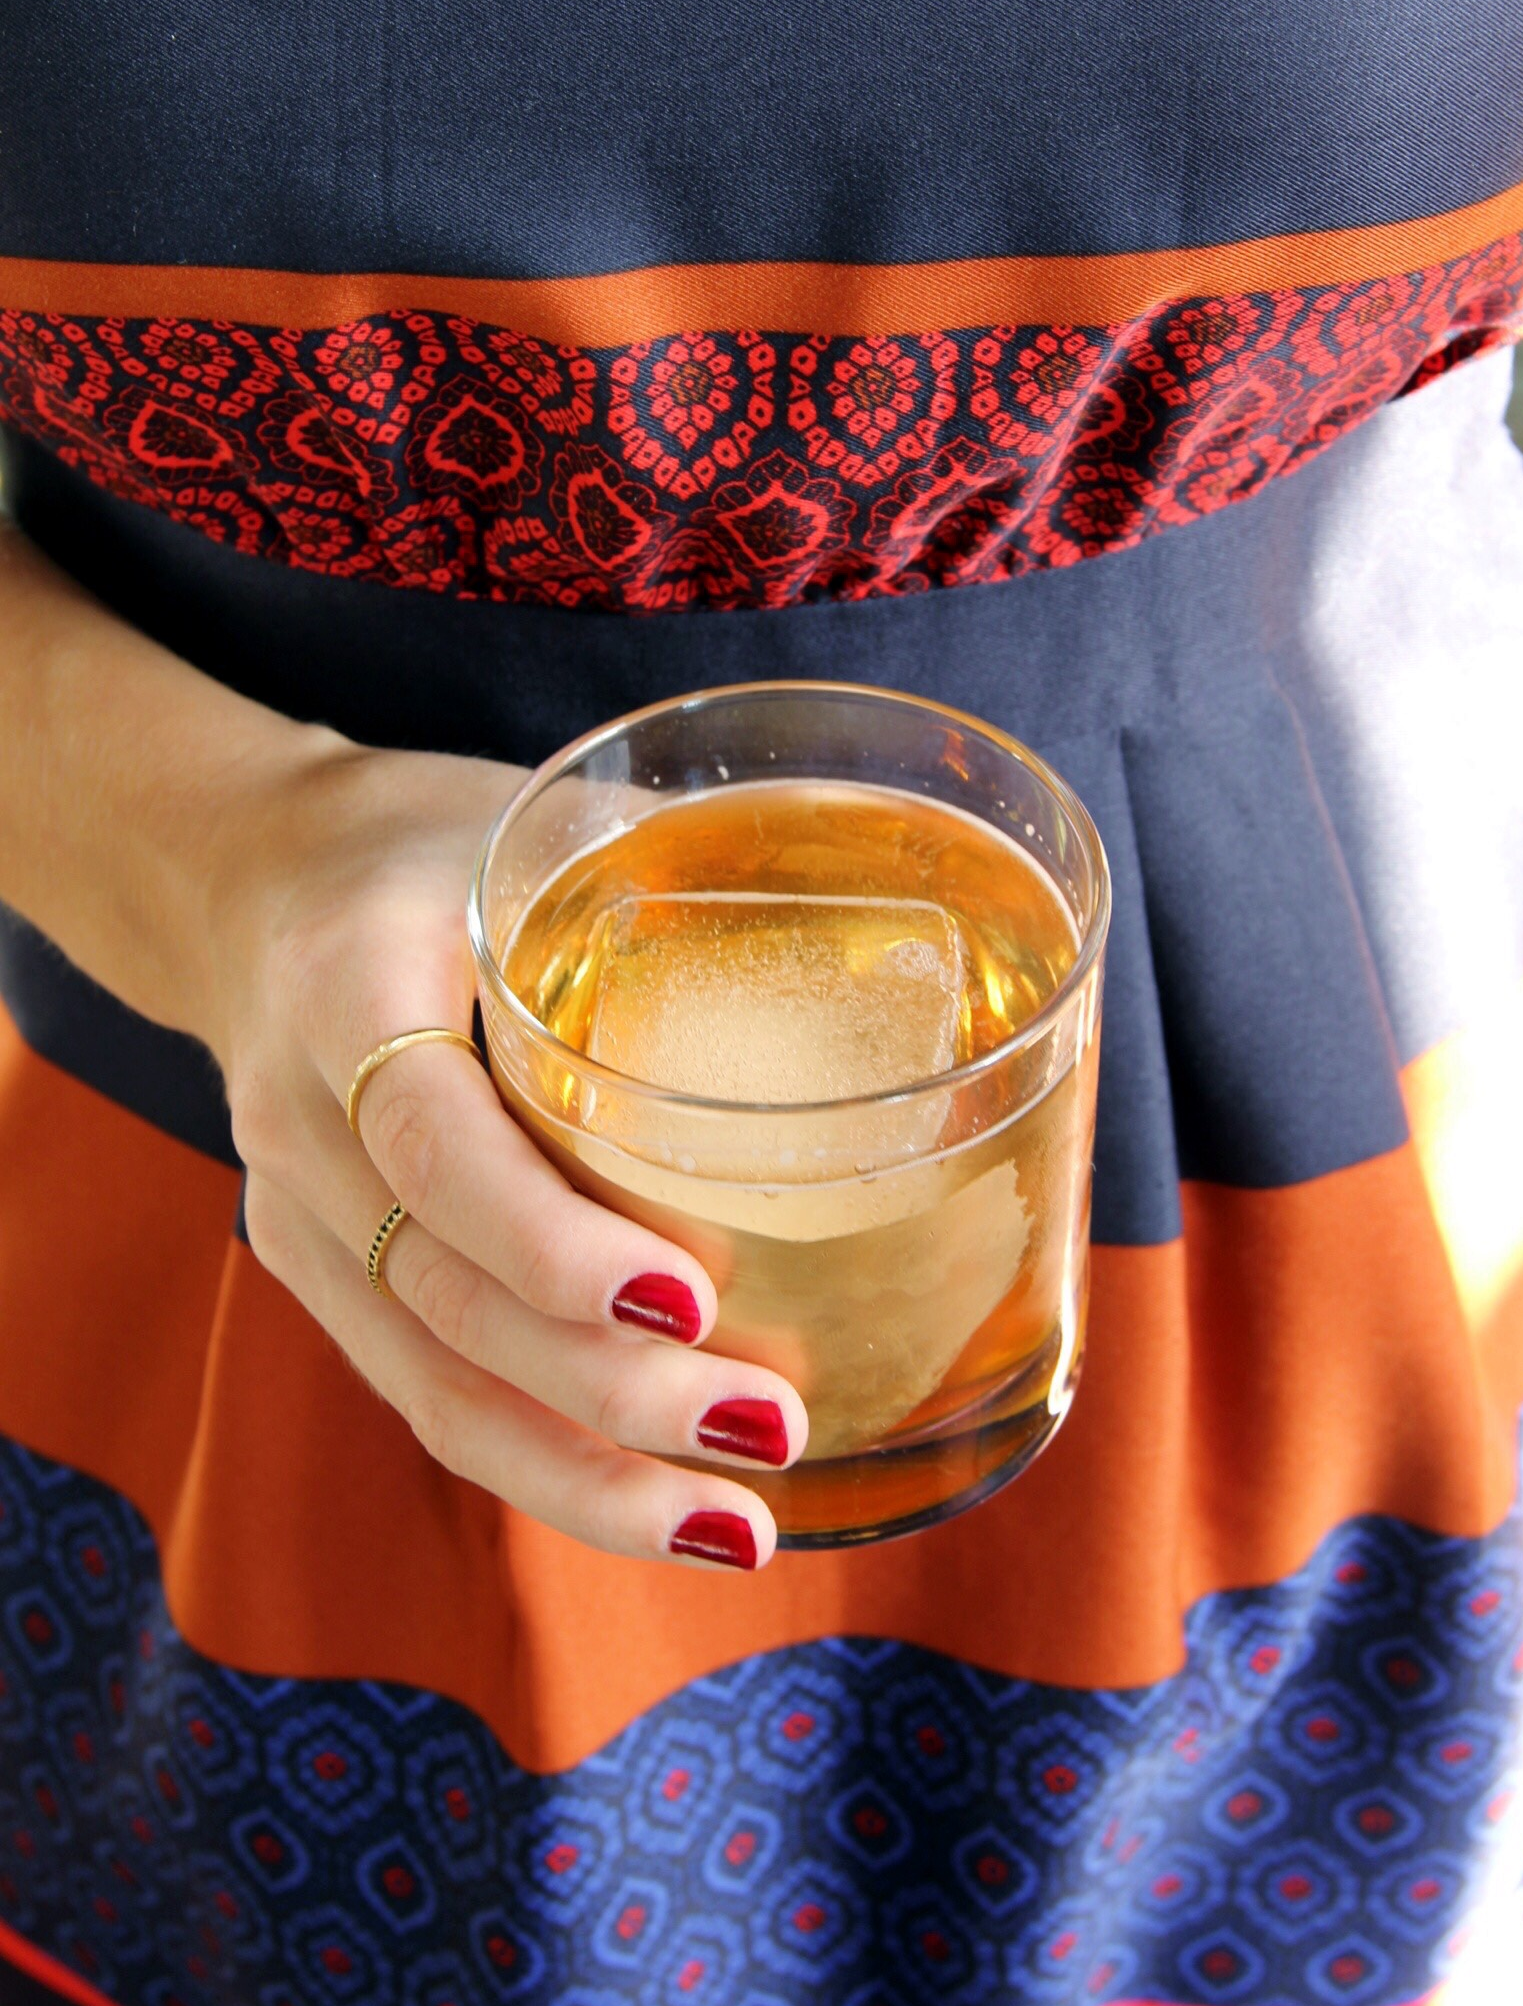 Autumn Sweater cocktail - The Pastiche